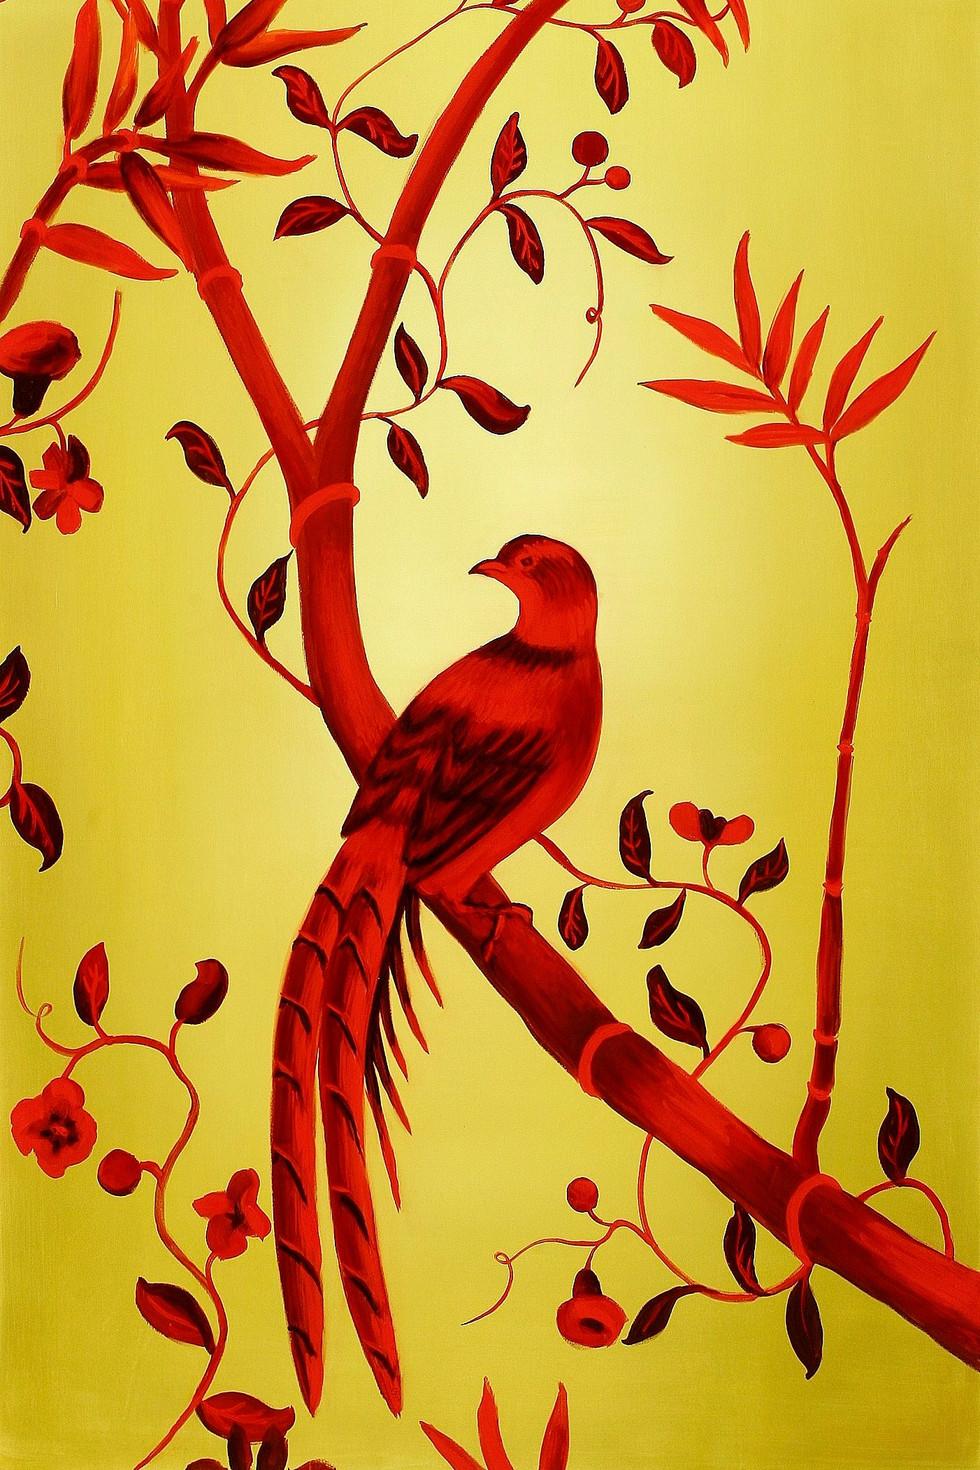 Bird, 2009, oil on canvas, 140 x 90 cm